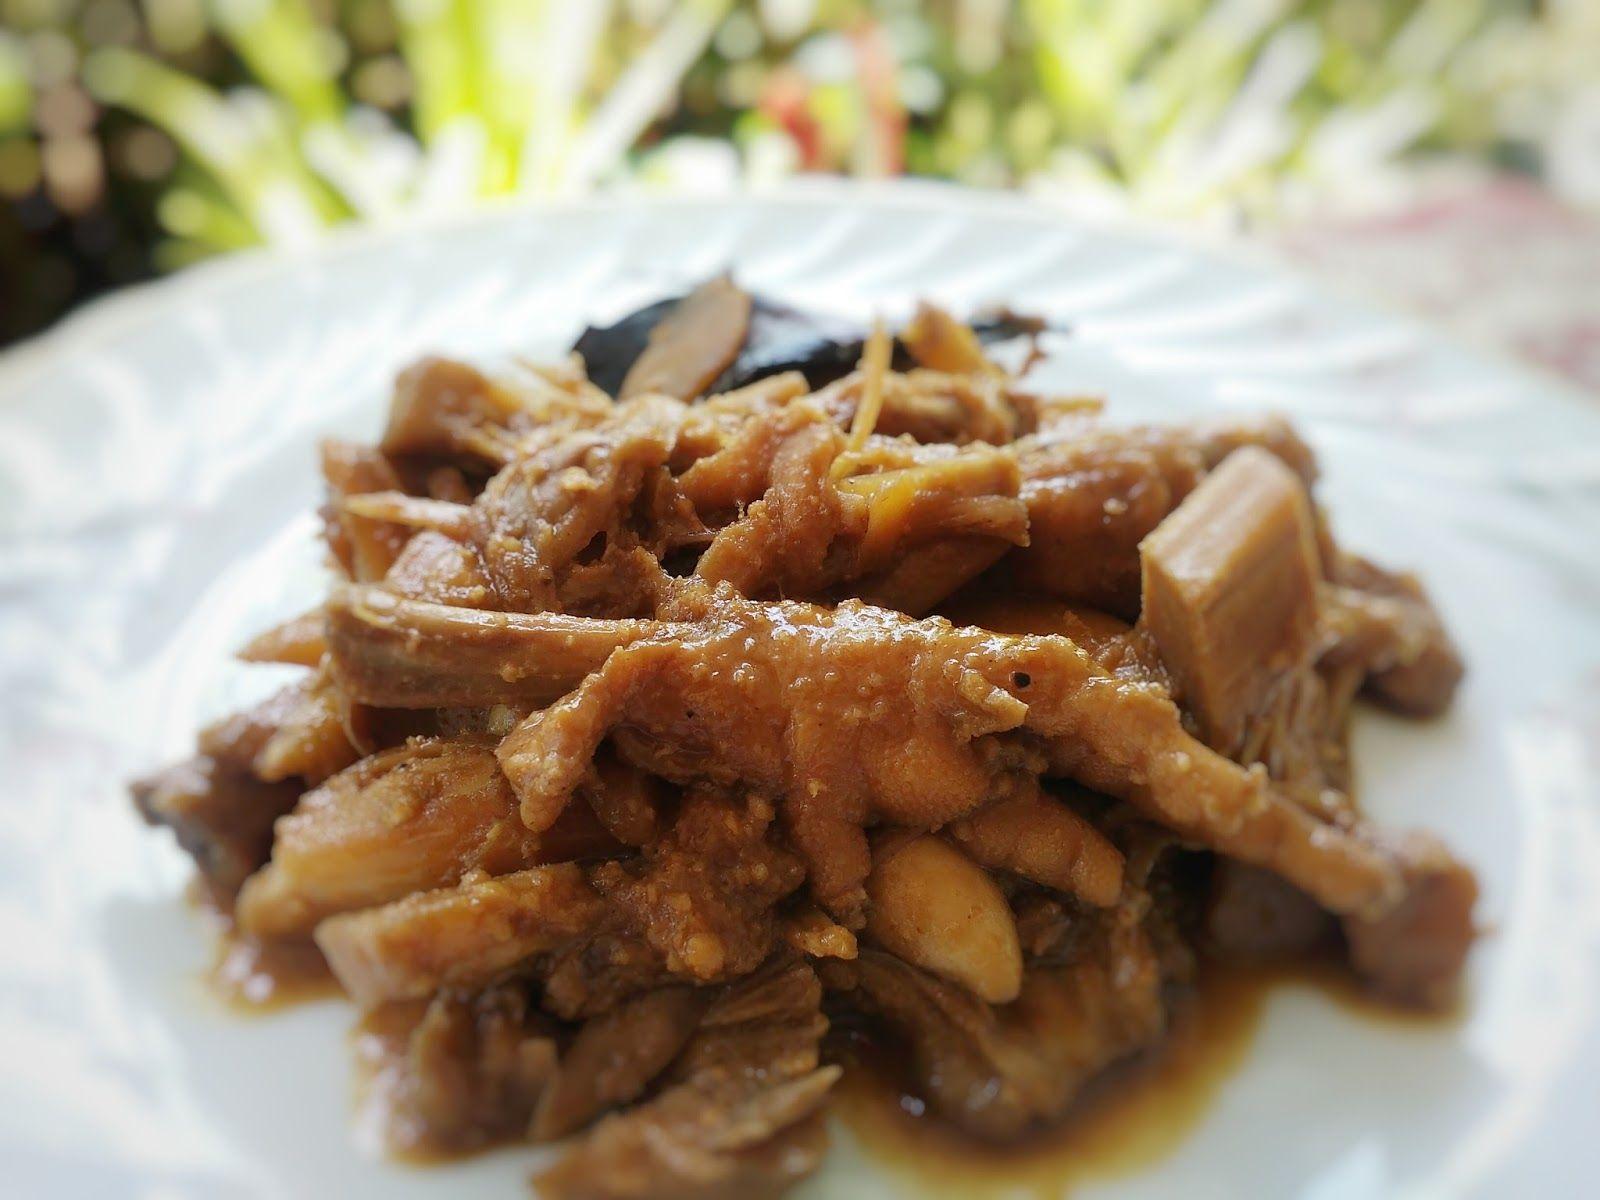 Resep Gudeg Nangka Ceker Ayam Resep Resep Masakan Indonesia Resep Masakan